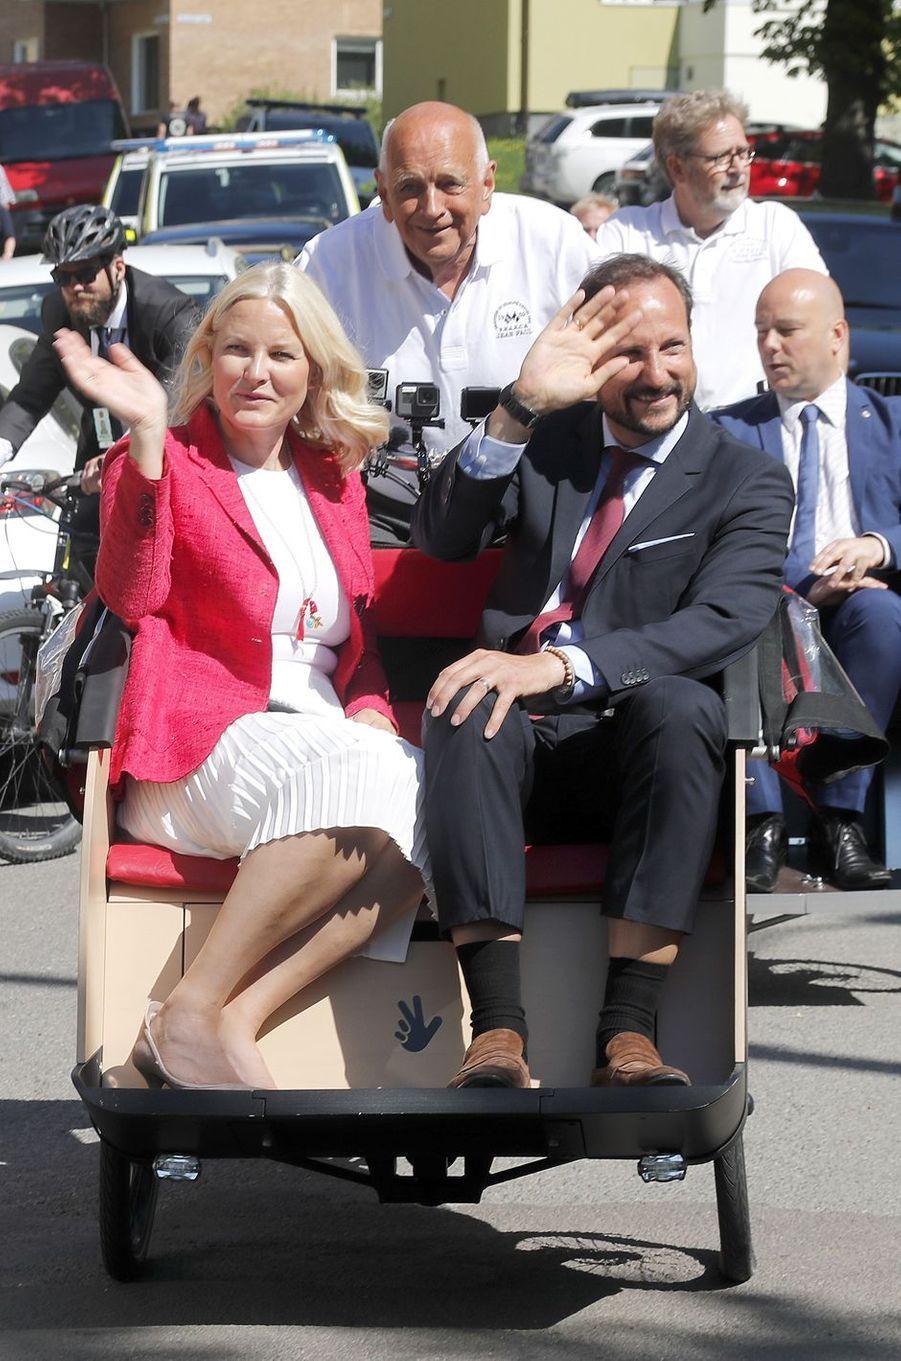 La princesse Mette-Marit et le prince Haakon de Norvège à Oslo, le 14 mai 2018